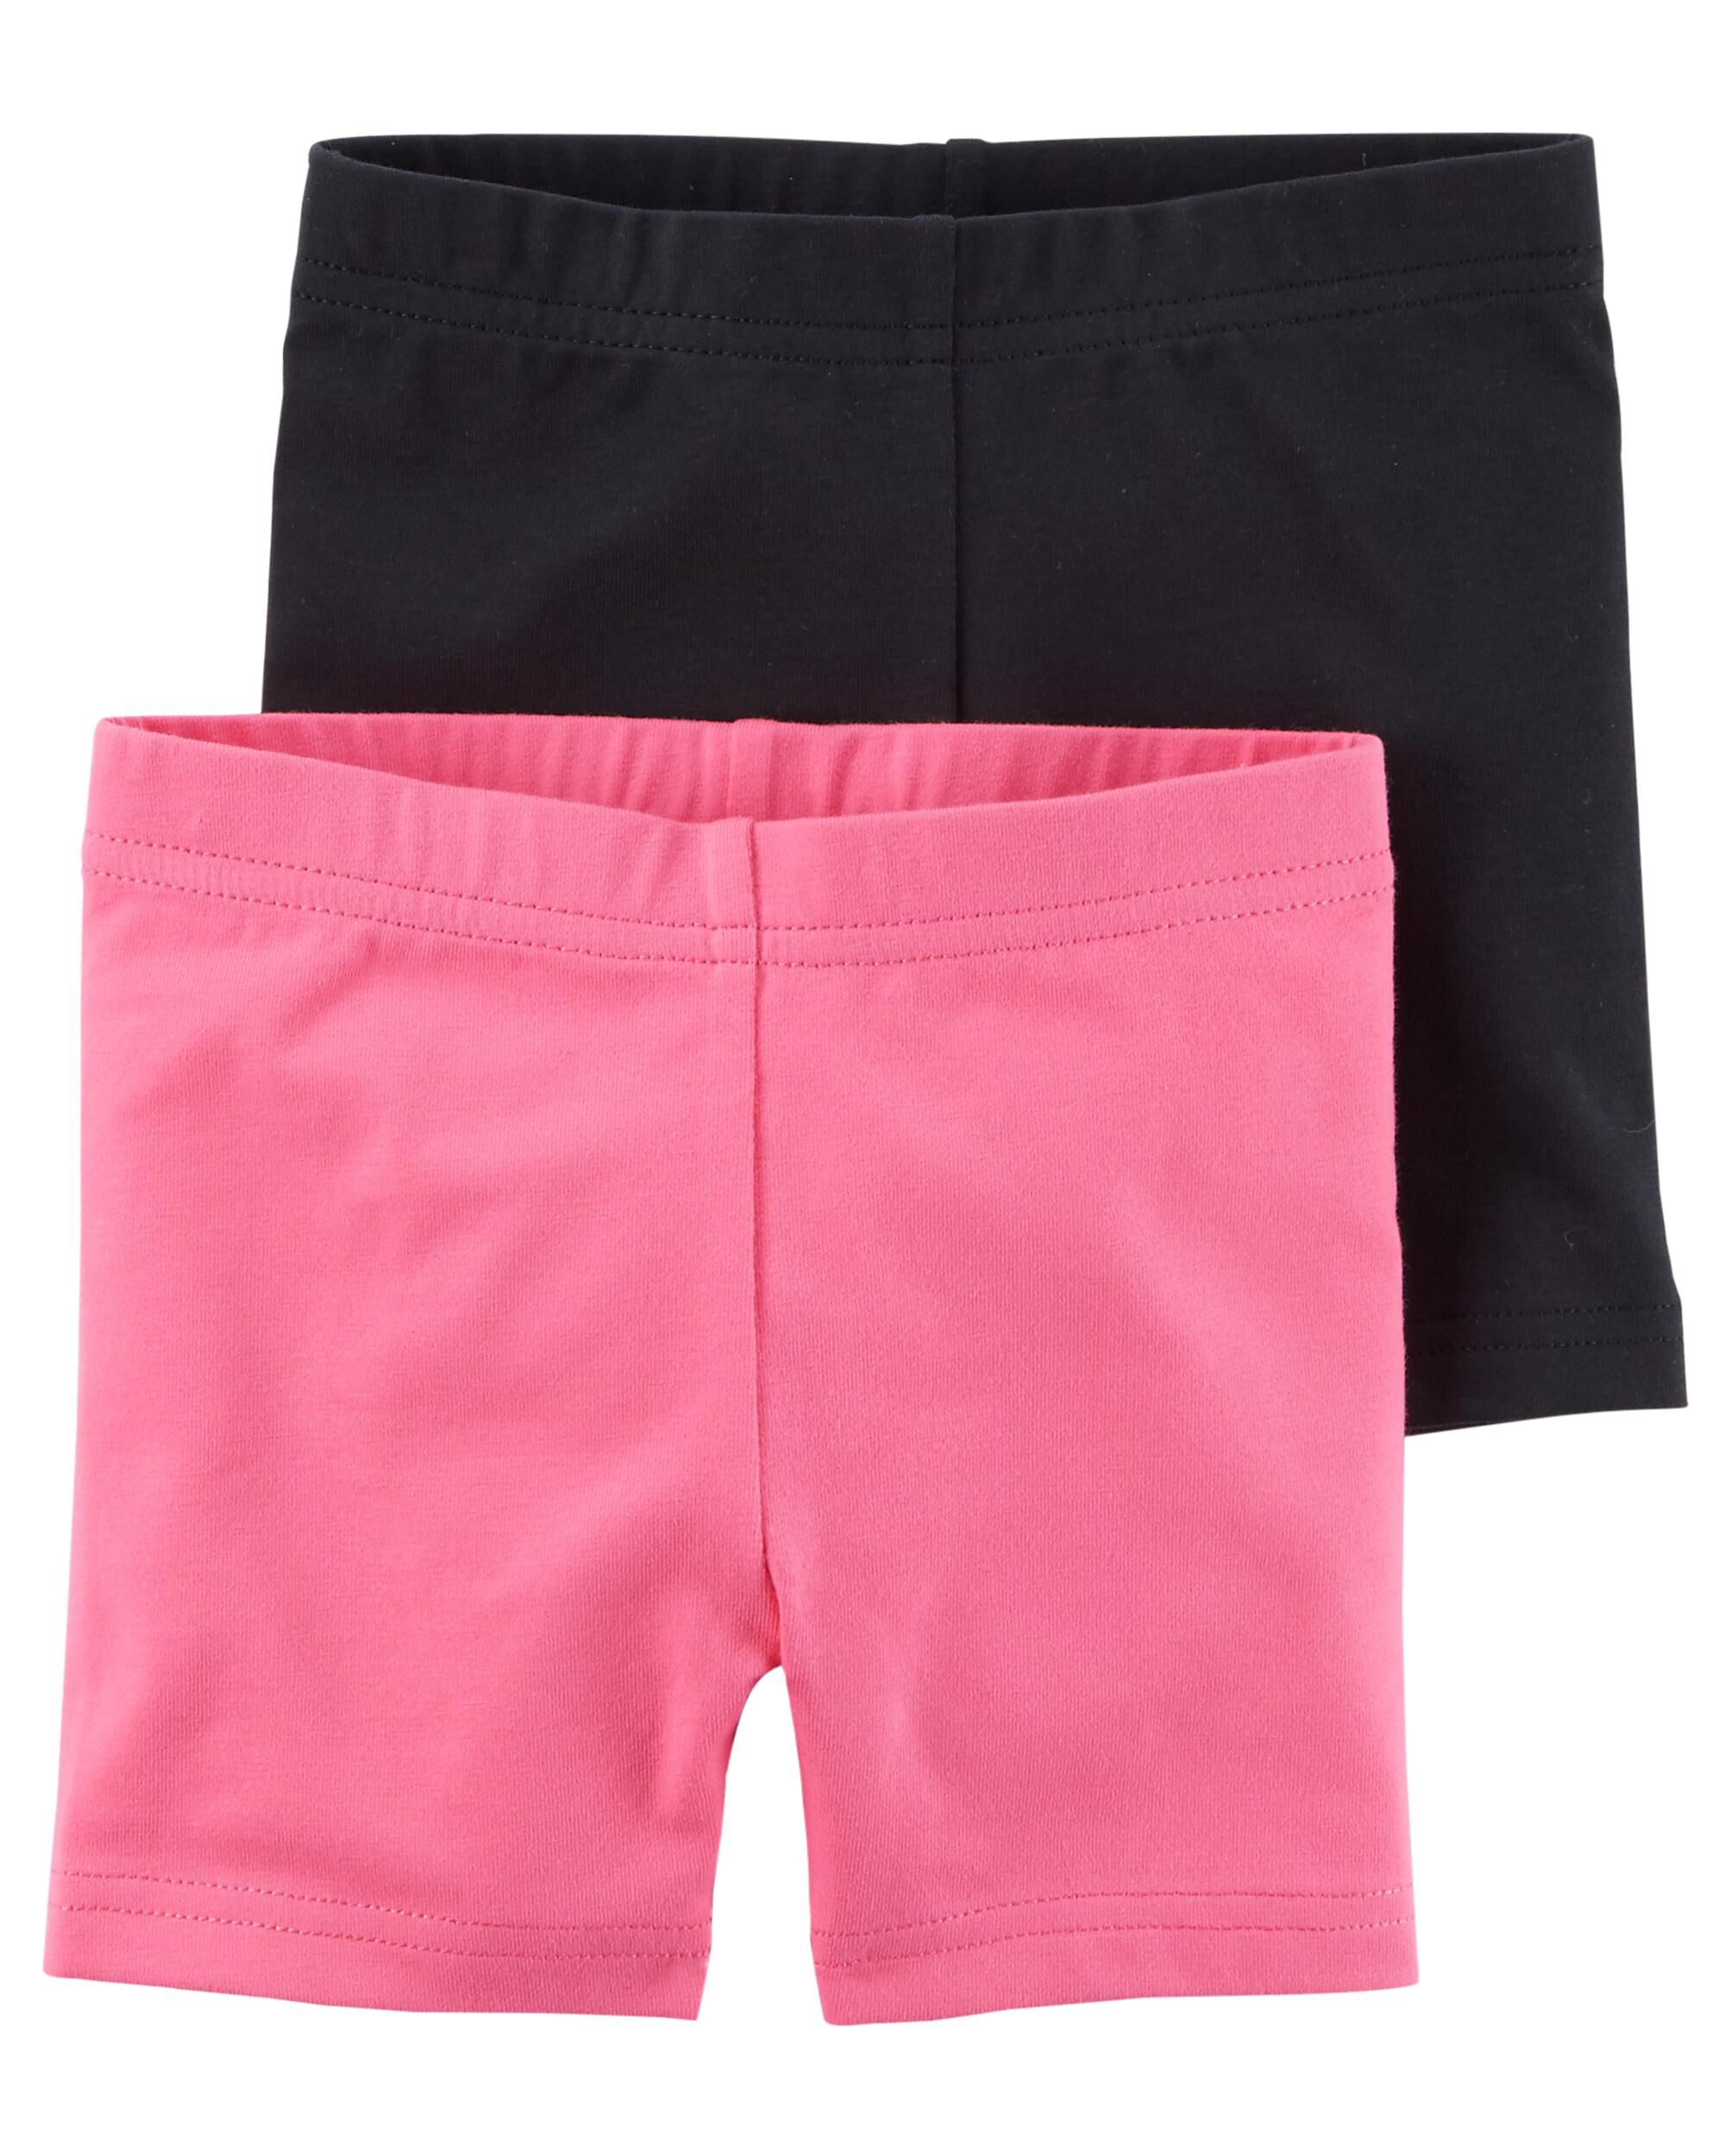 Girls Bottoms & Pants   Carter's   Free Shipping